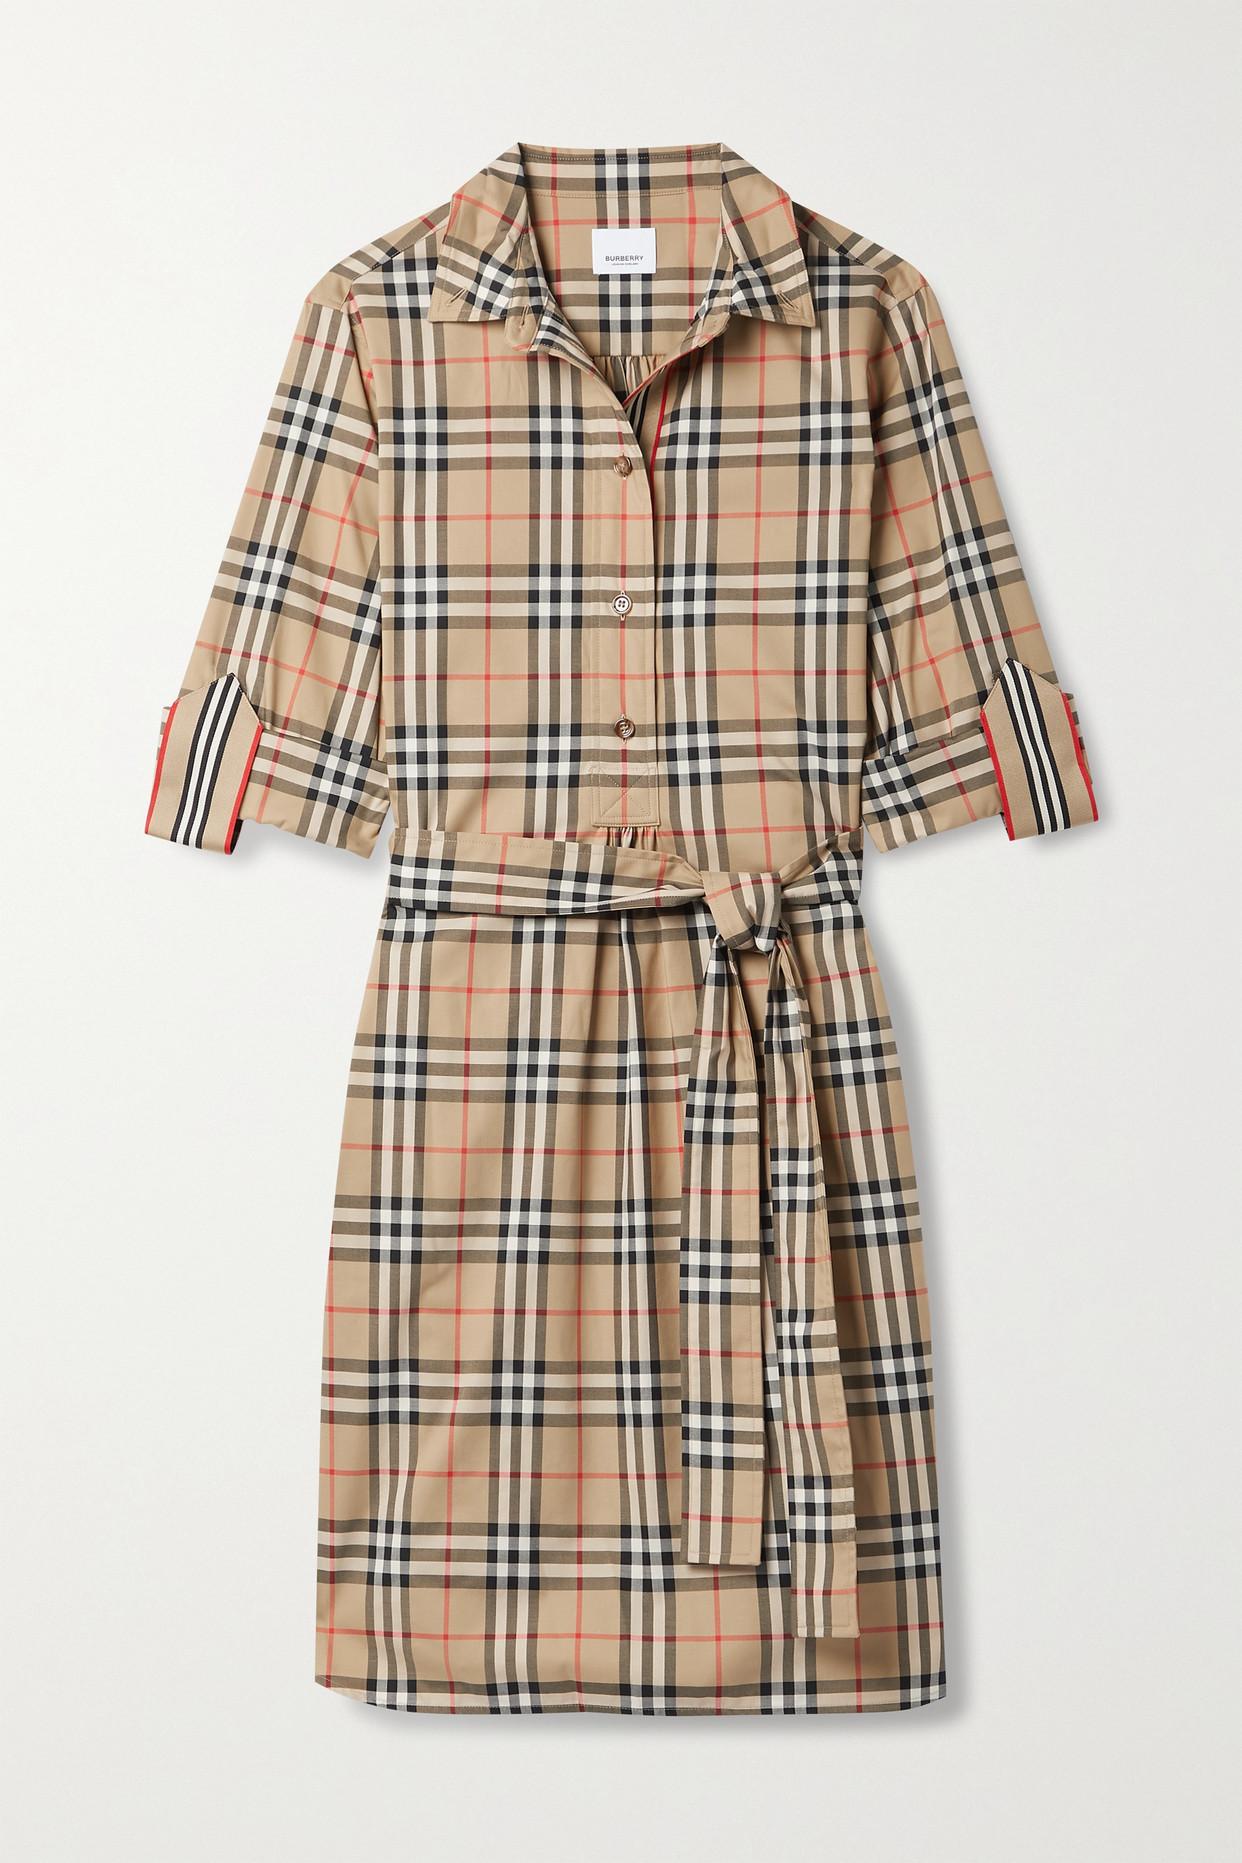 BURBERRY - + Net Sustain Belted Checked Cotton-blend Poplin Mini Shirt Dress - Brown - UK10